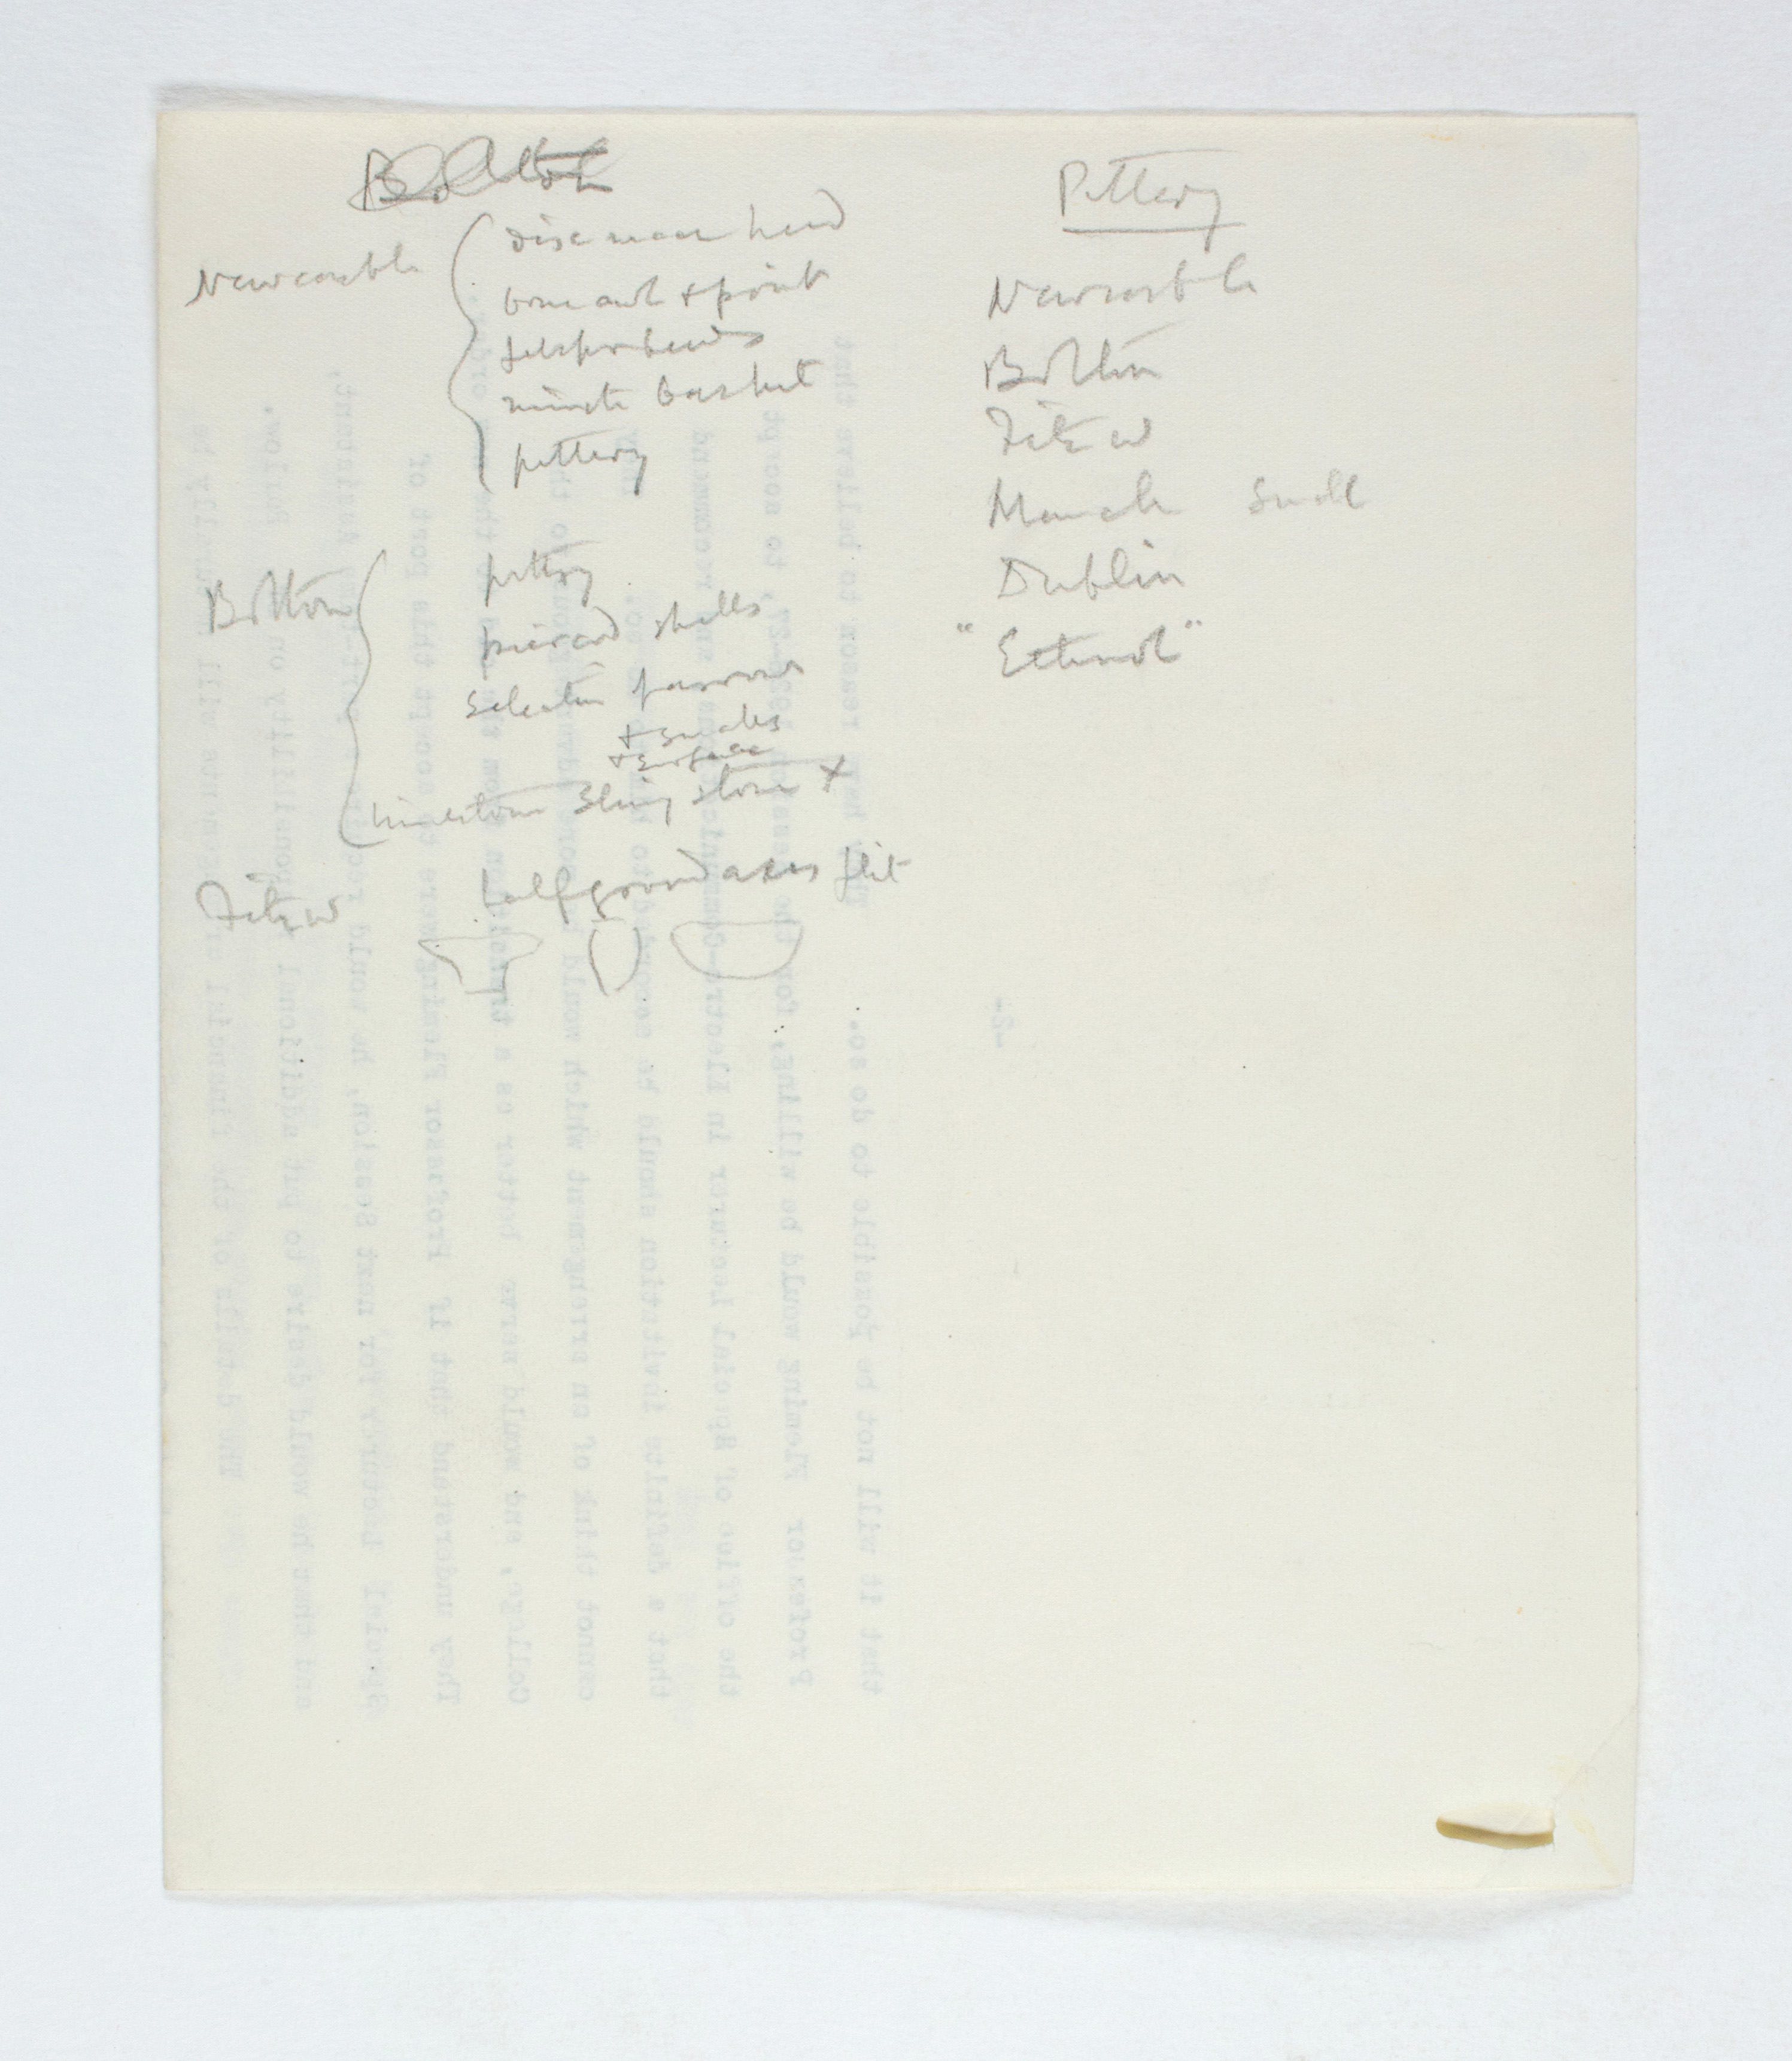 1925-26 Badari, Faiyum Multiple institution list PMA/WFP1/D/29/1.2